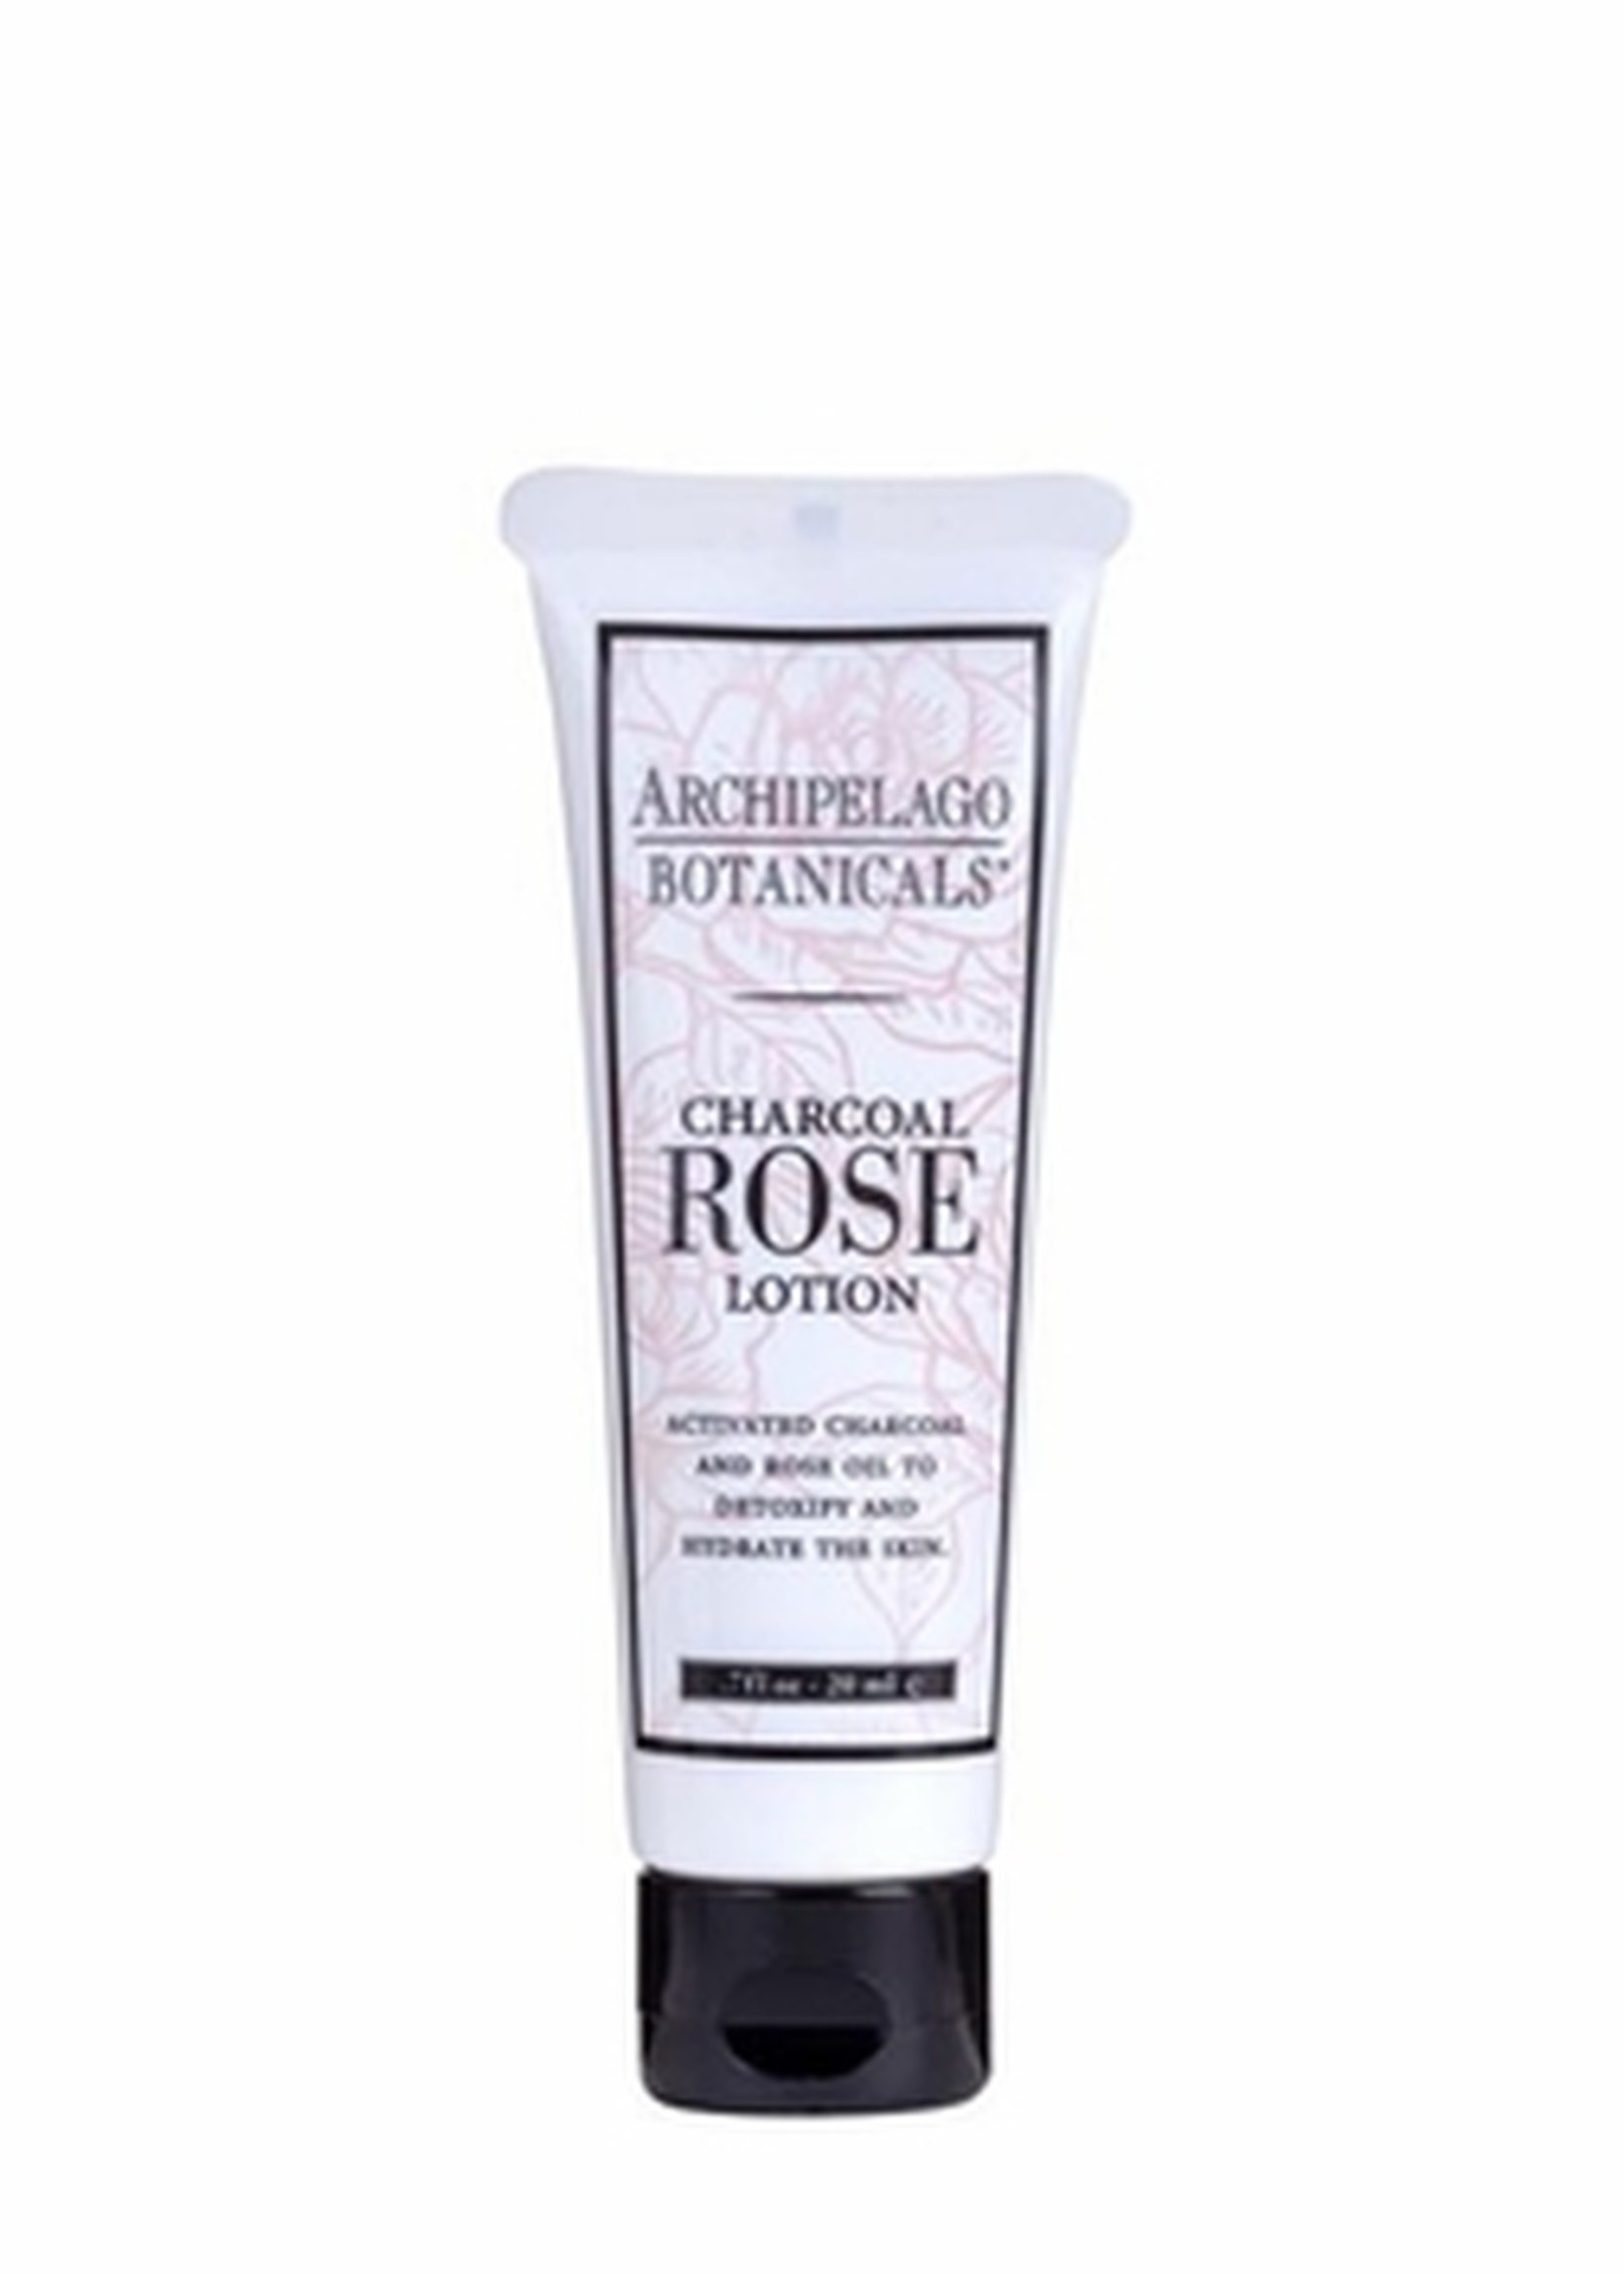 Archipelago Charcoal Rose 7oz Lotion